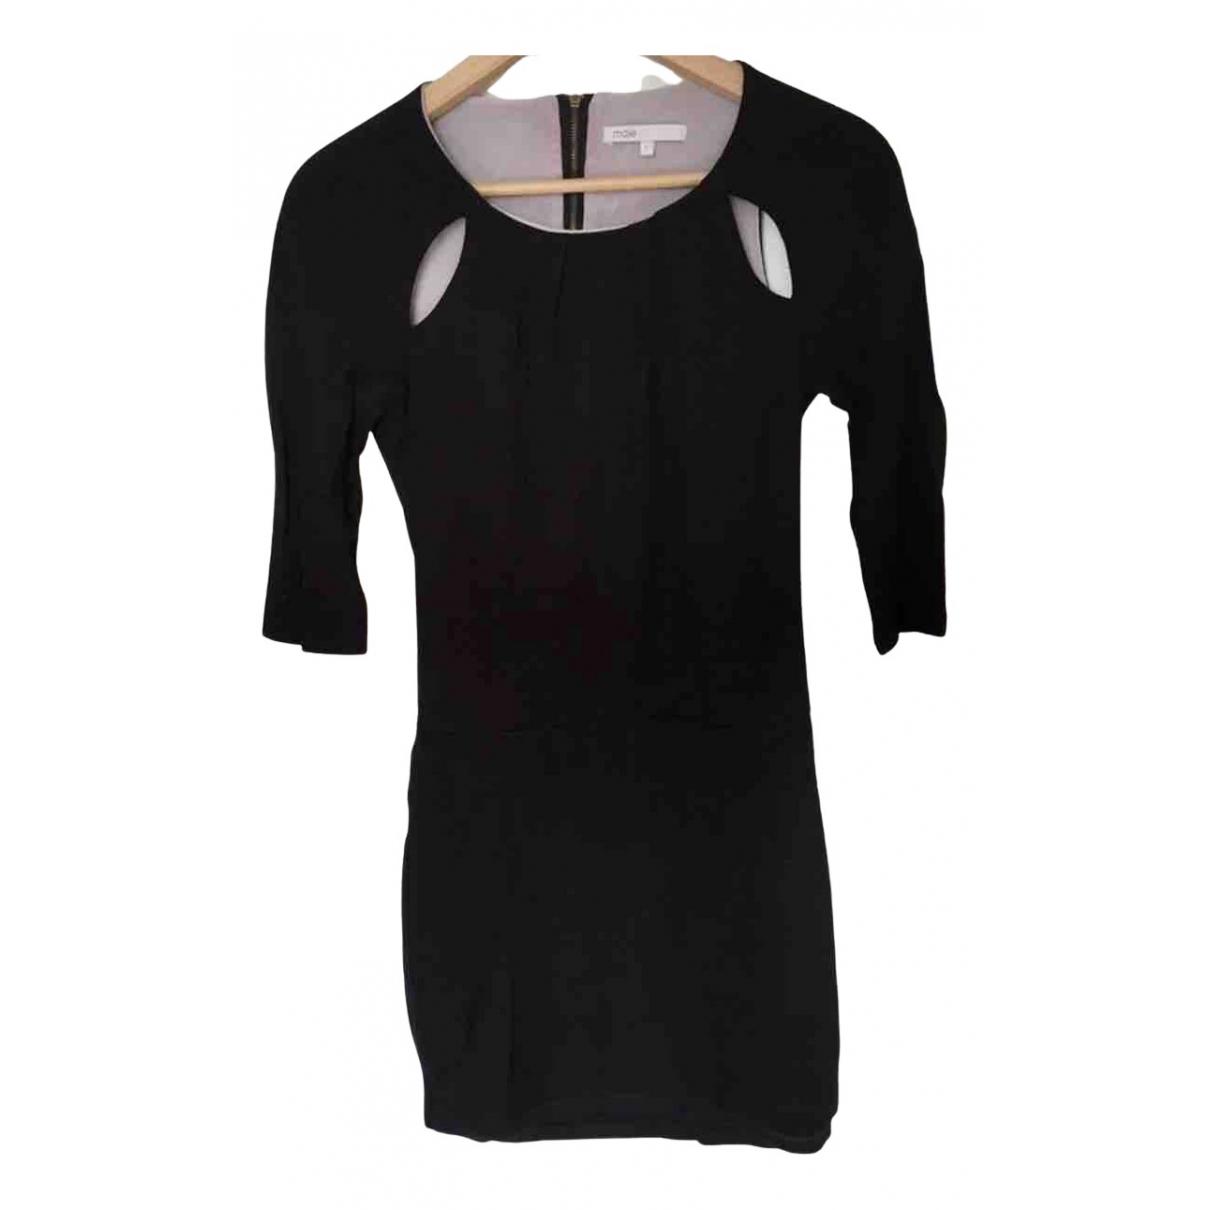 Maje N Black Cotton dress for Women 1 US